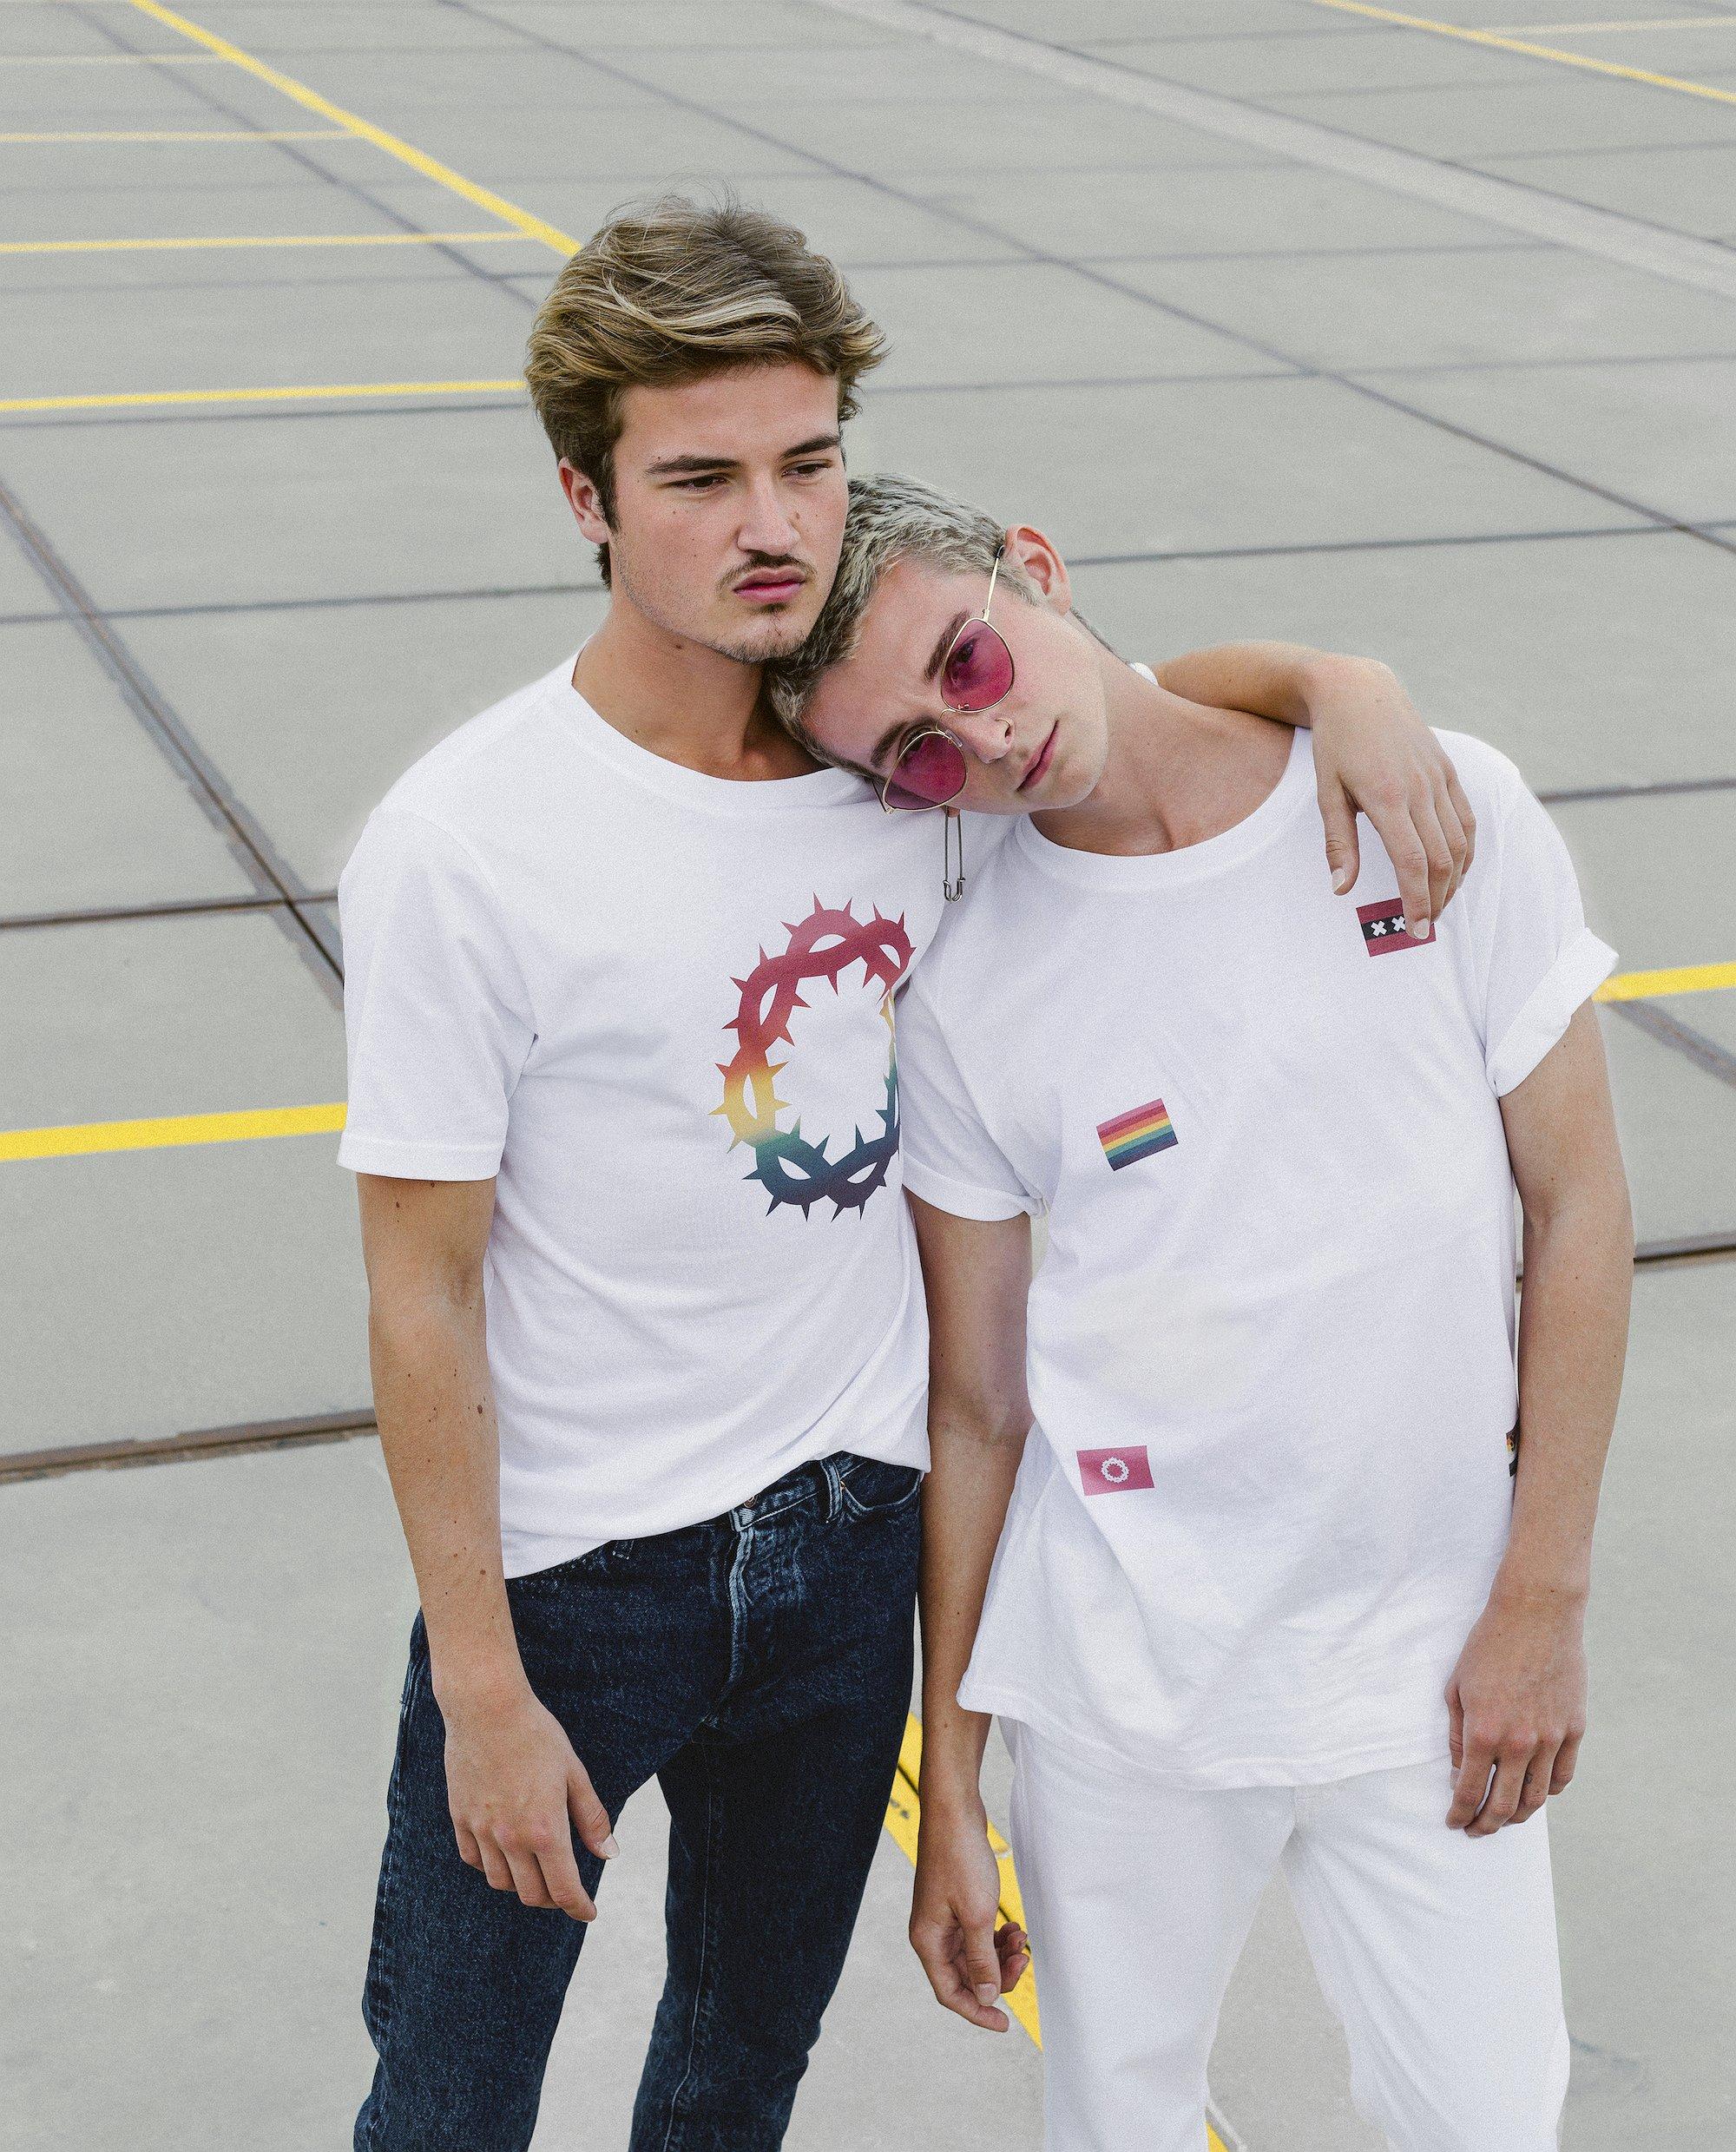 Heb je nog geen Pride outfit? Gsus komt met Regenboog-shirts!